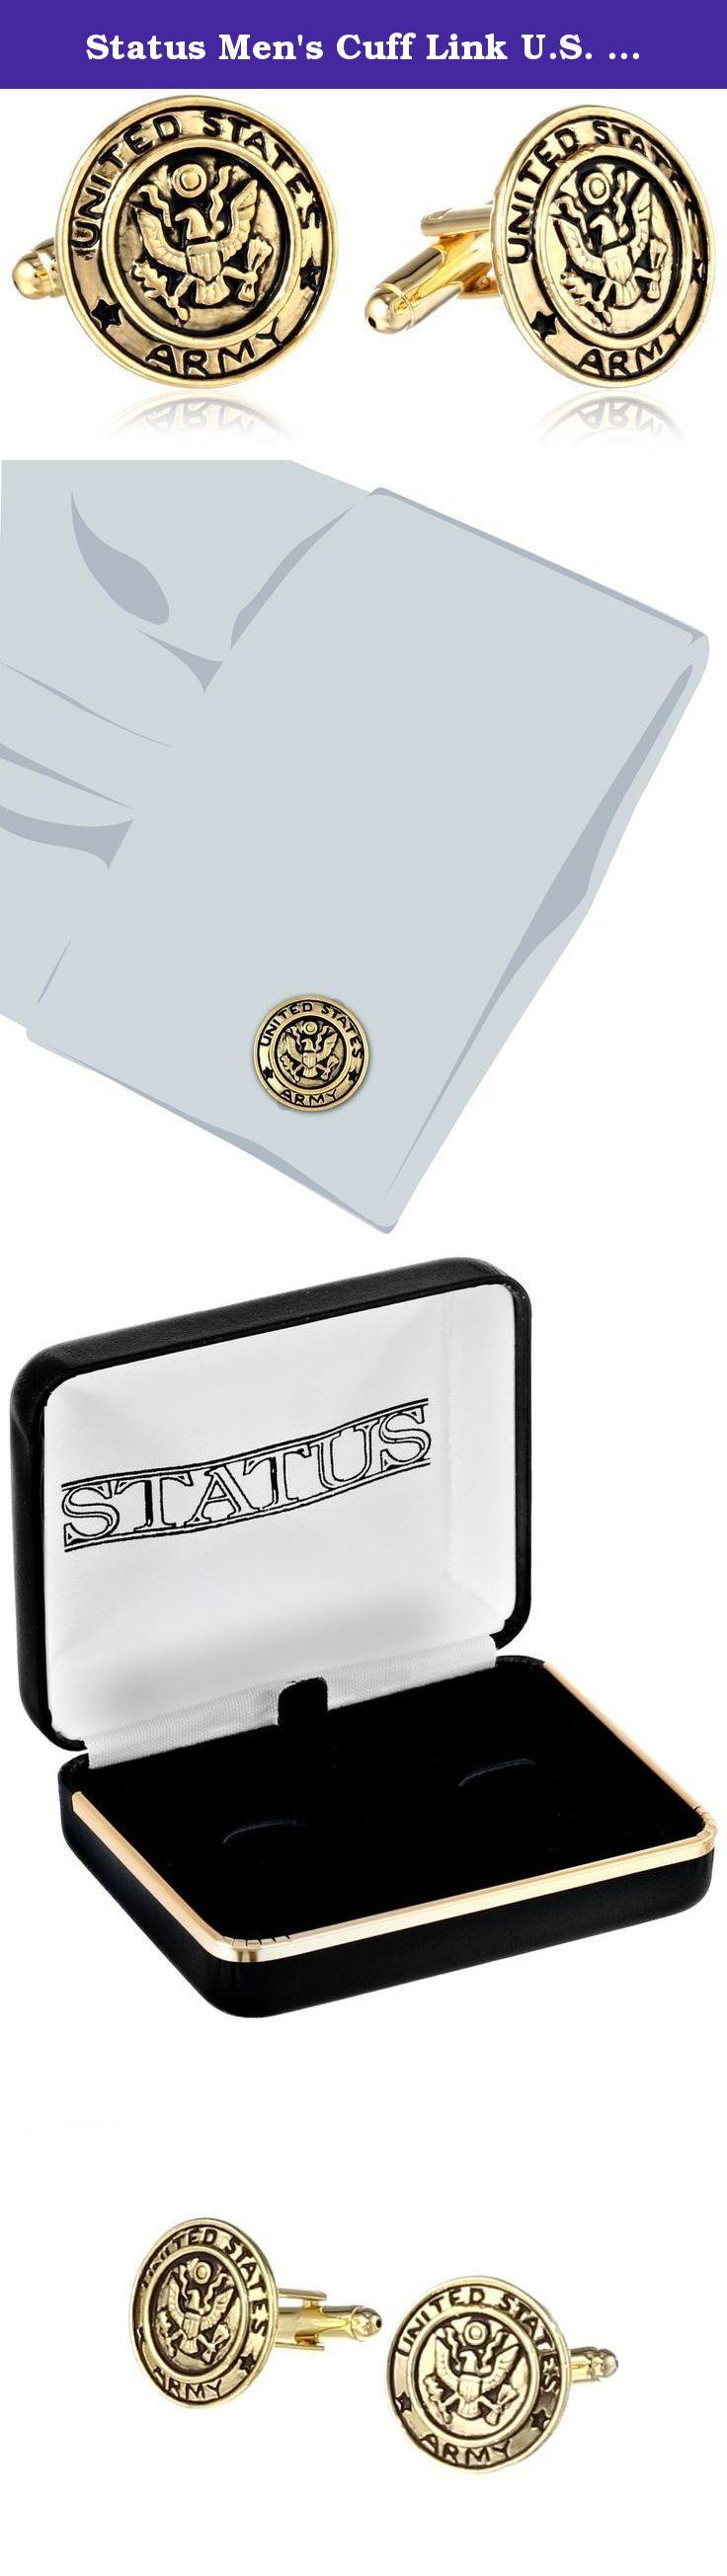 Army Status Mens Cuff Link U.S